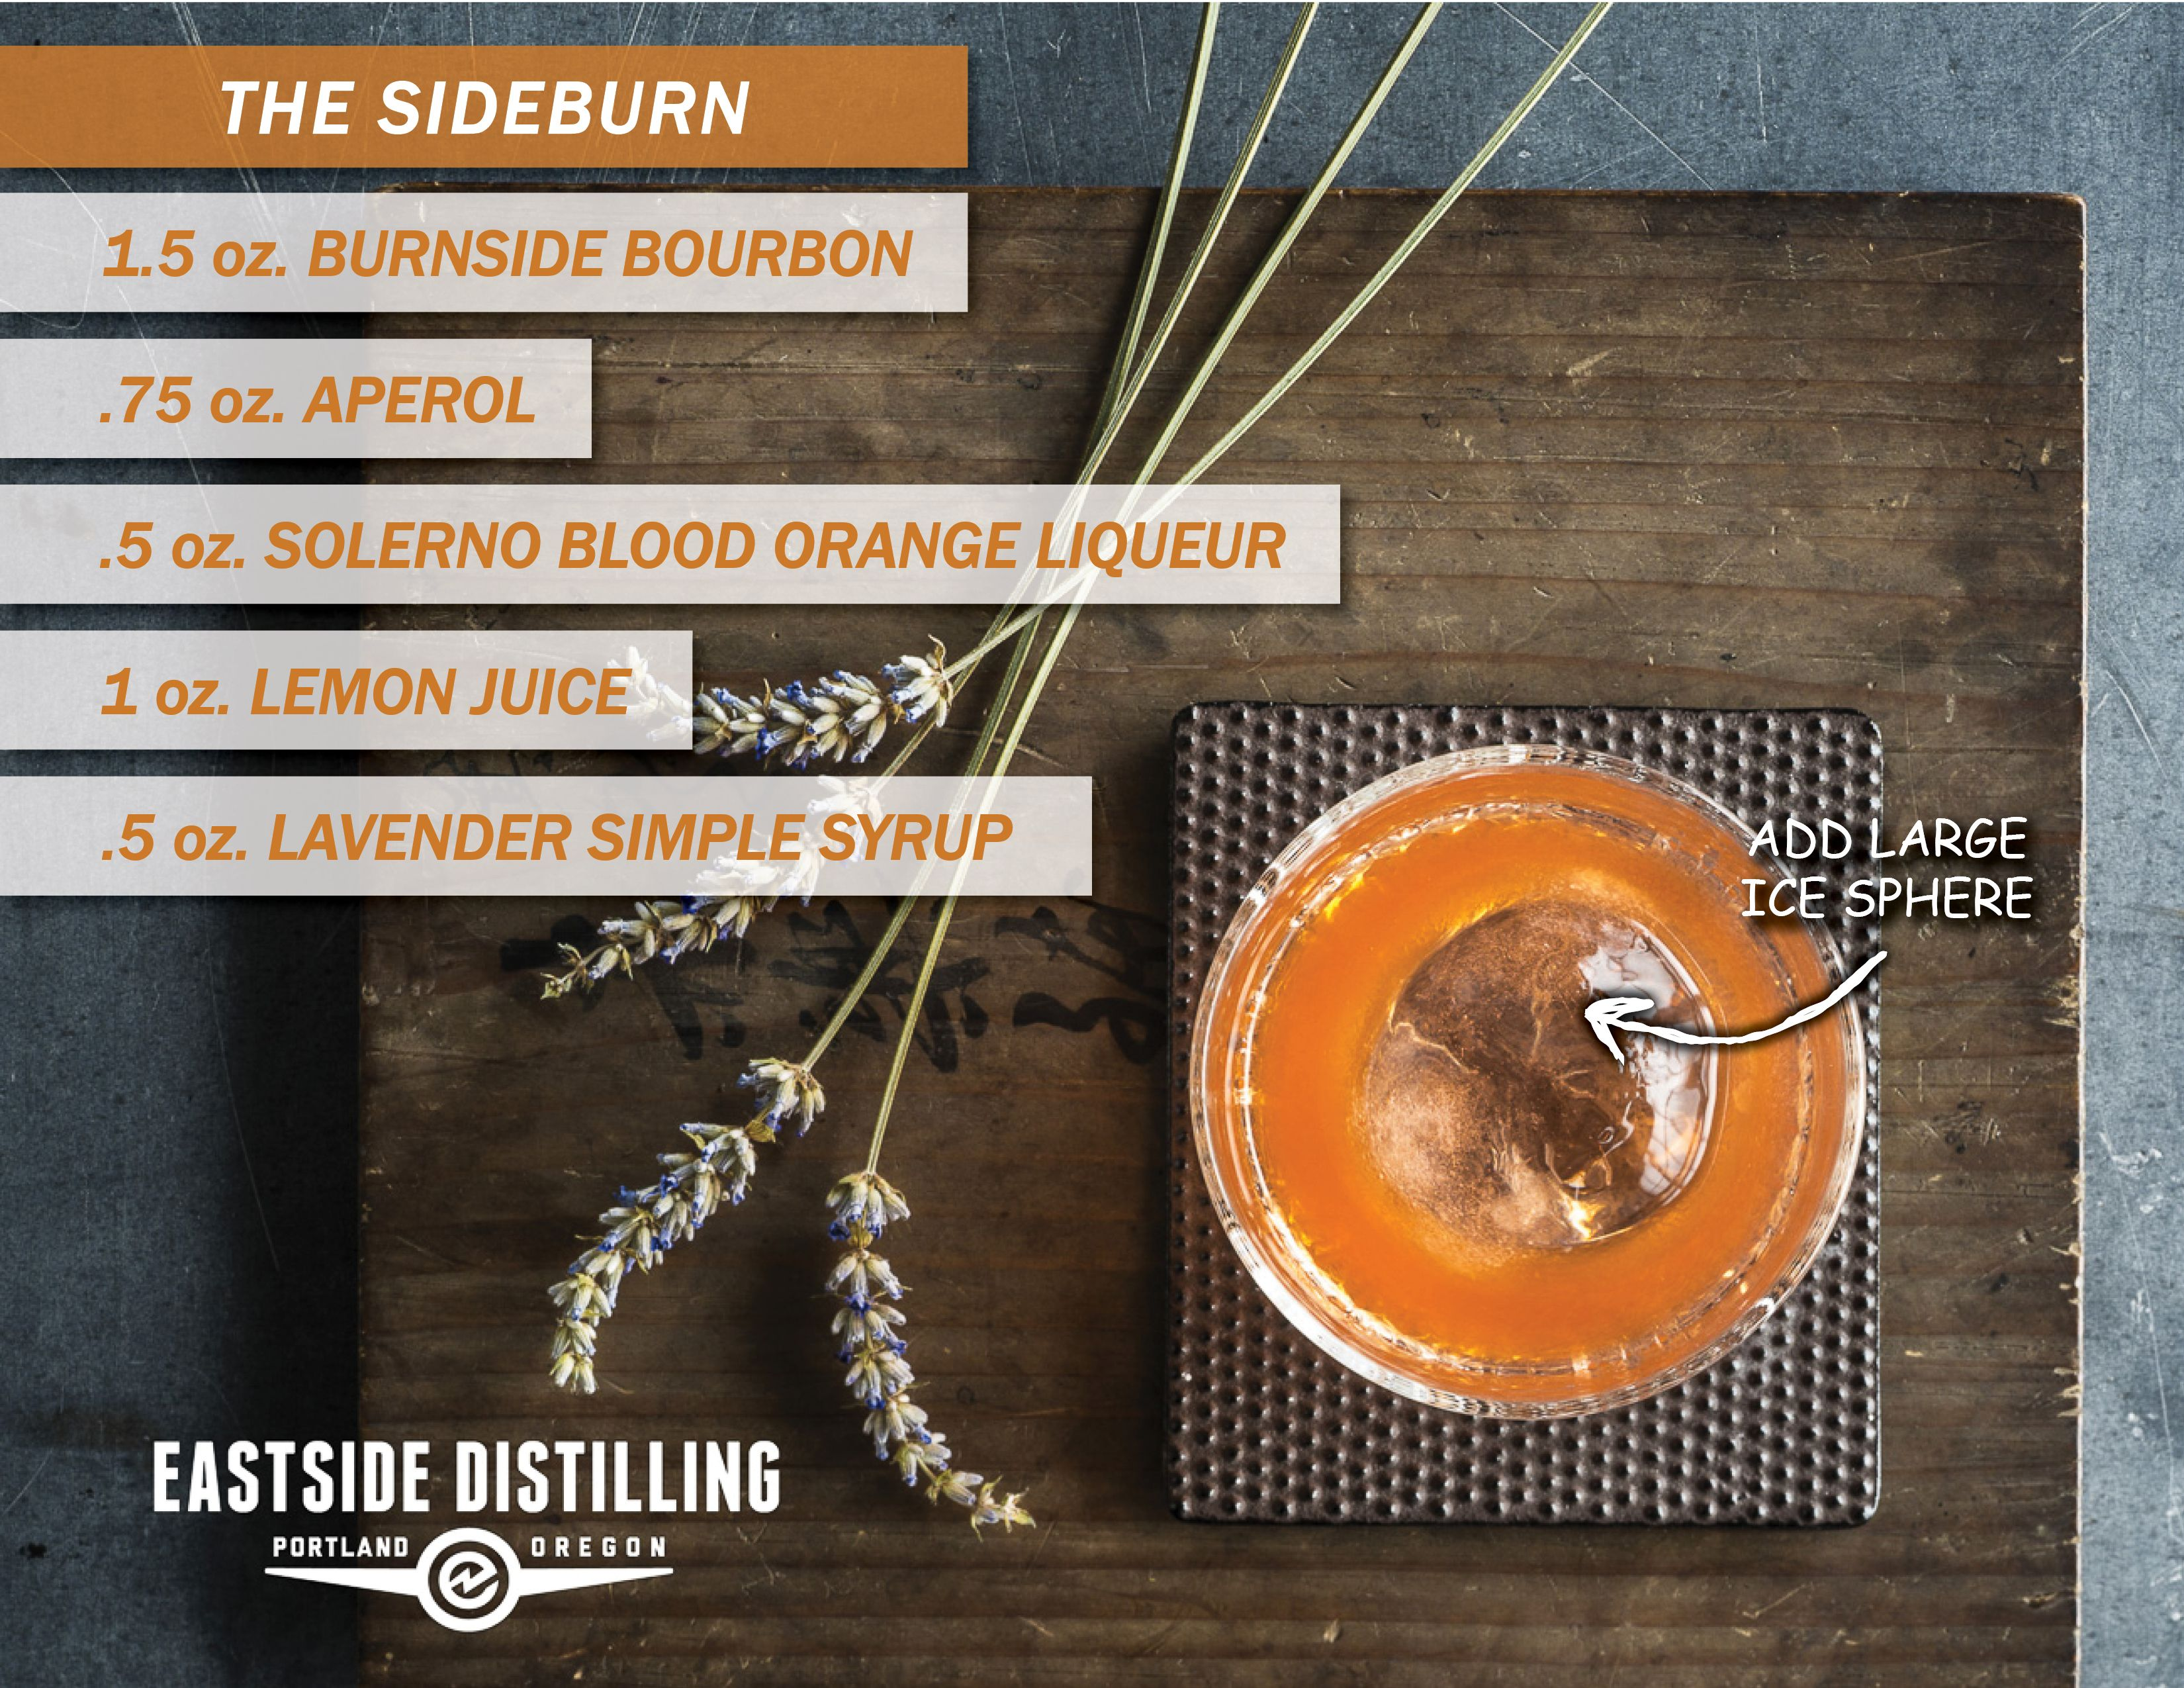 The Sideburn